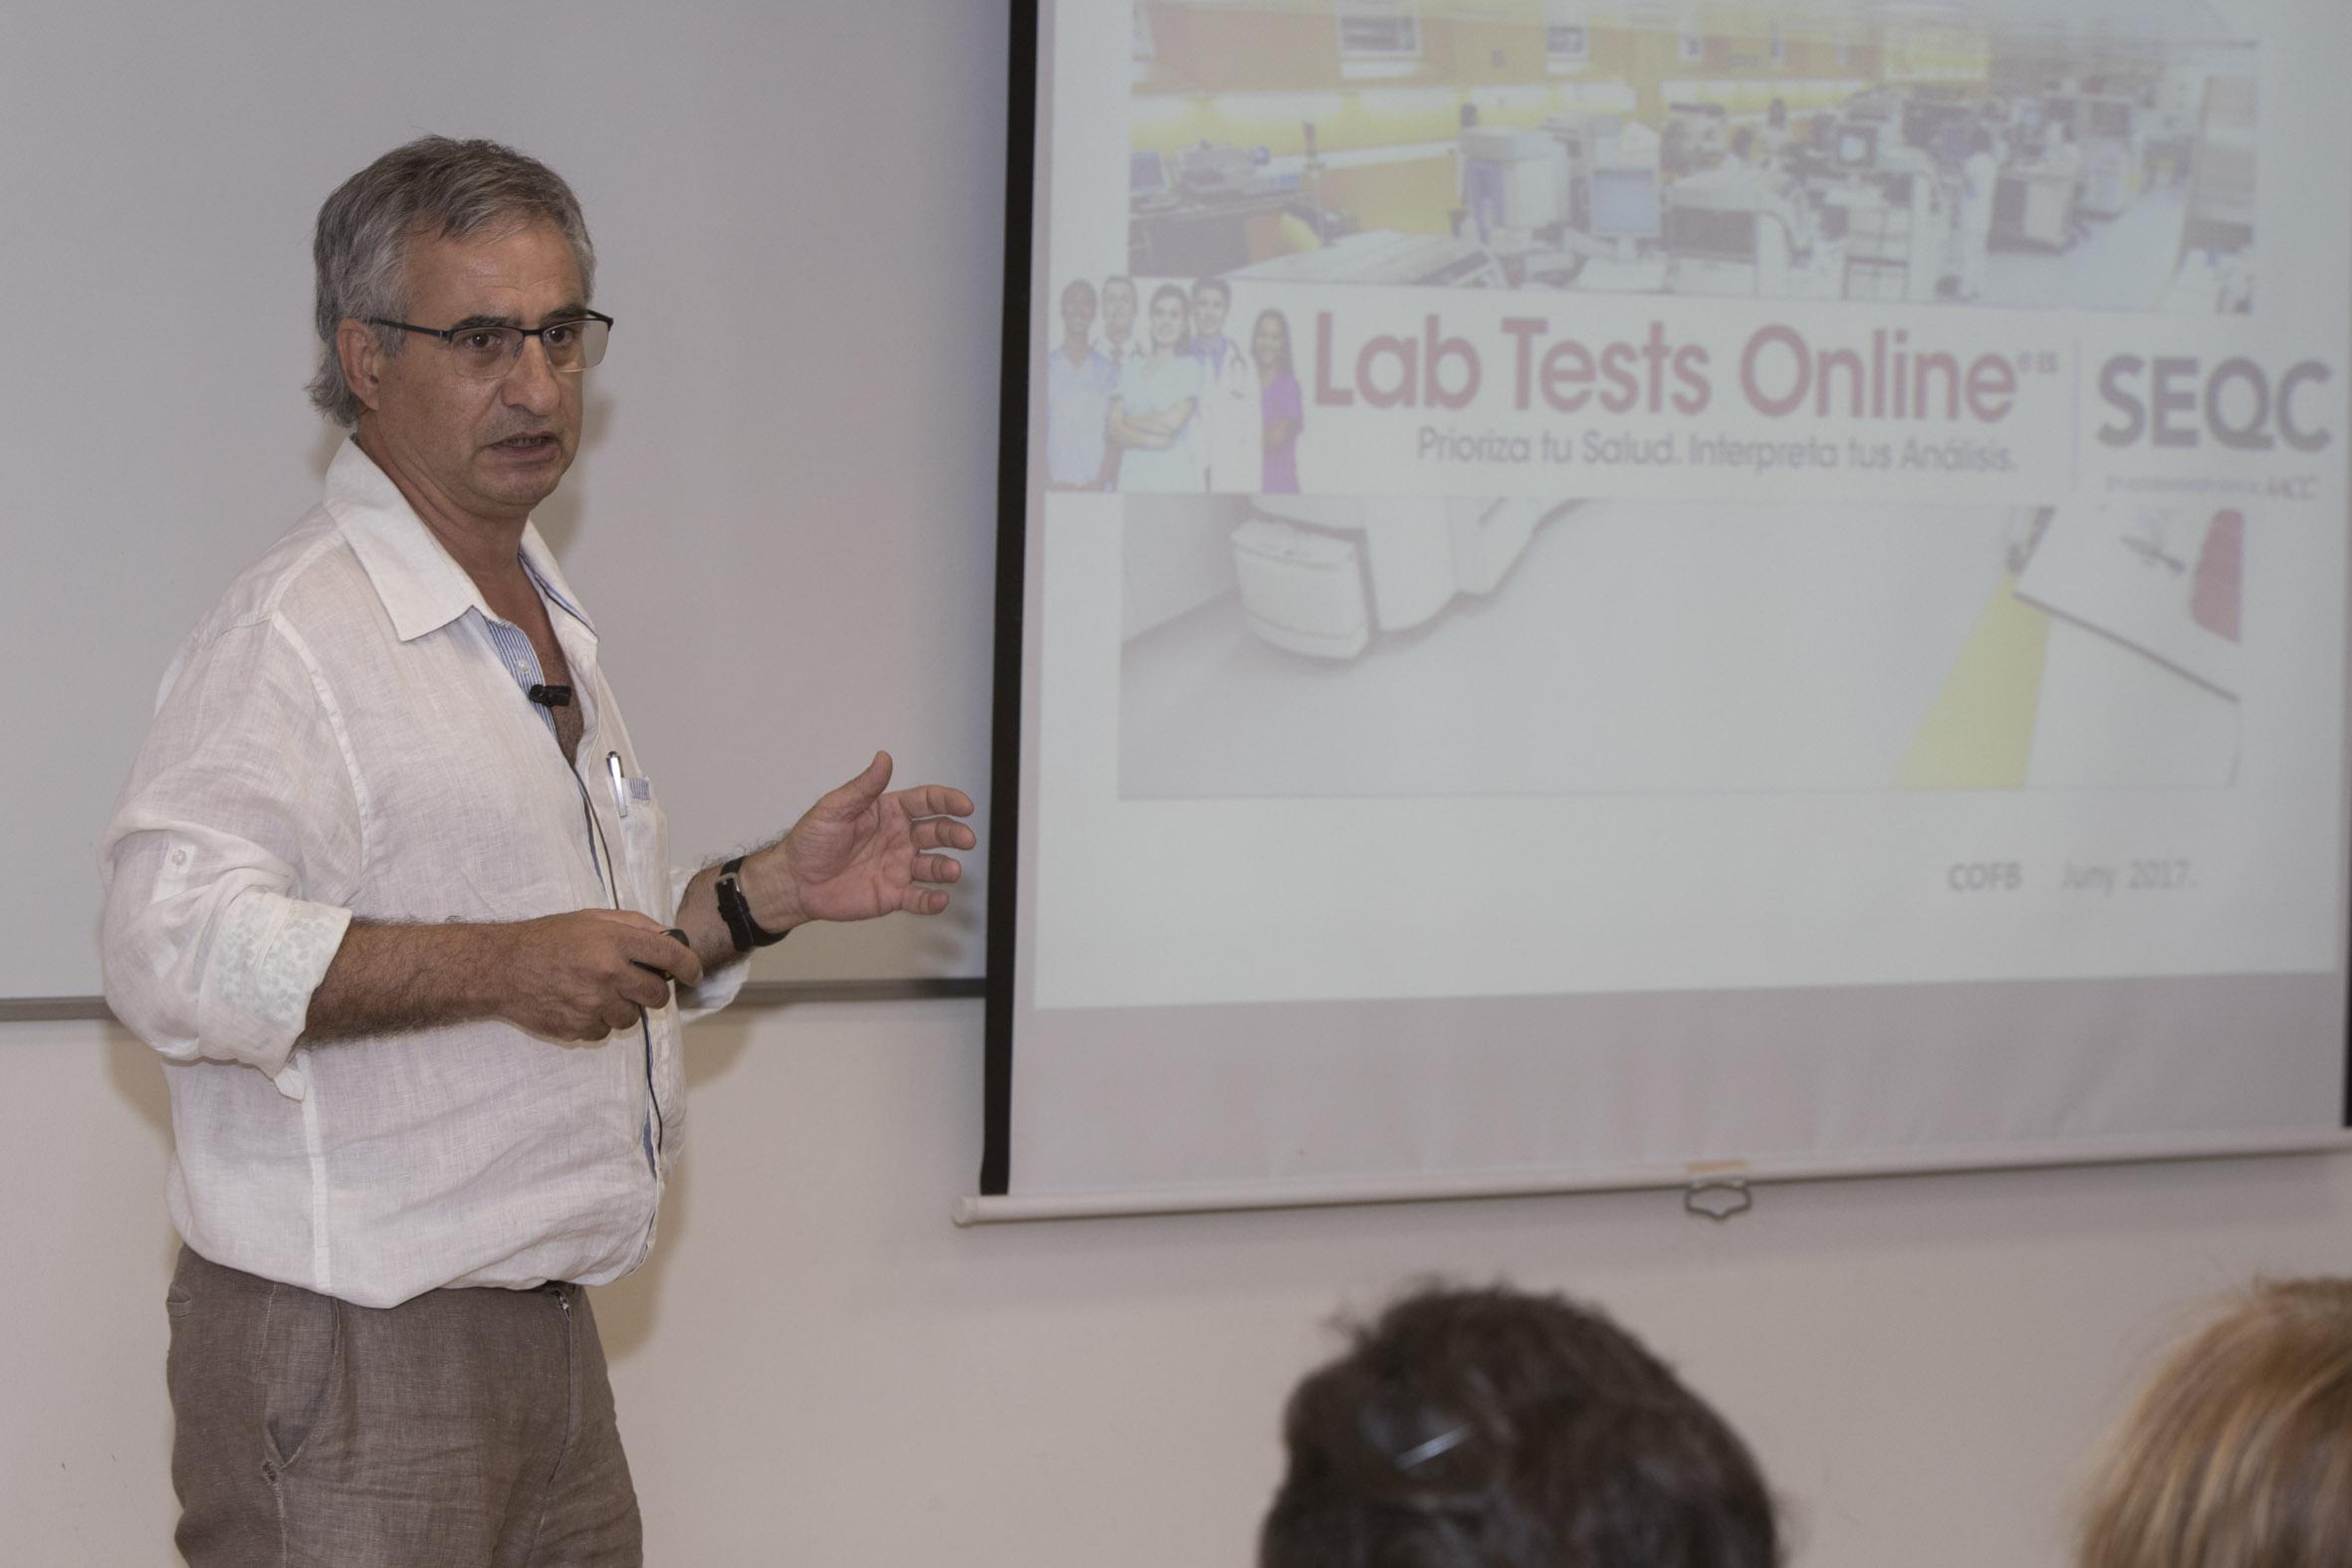 labtests-COFB (2)